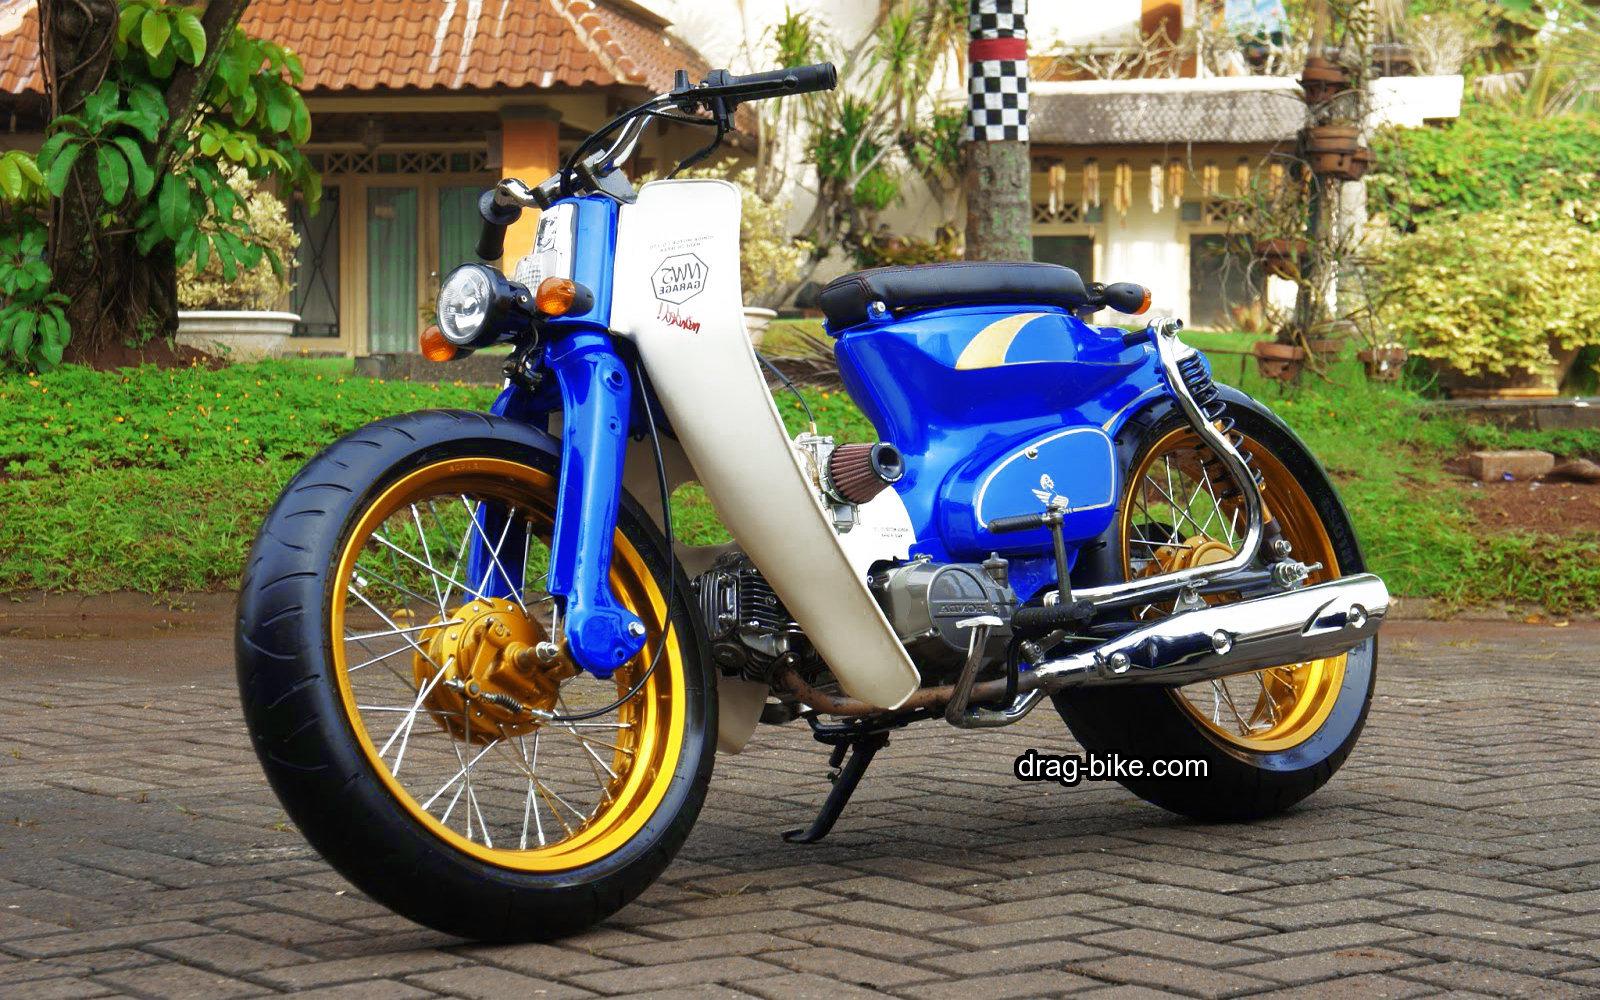 modifikasi c70 jap style